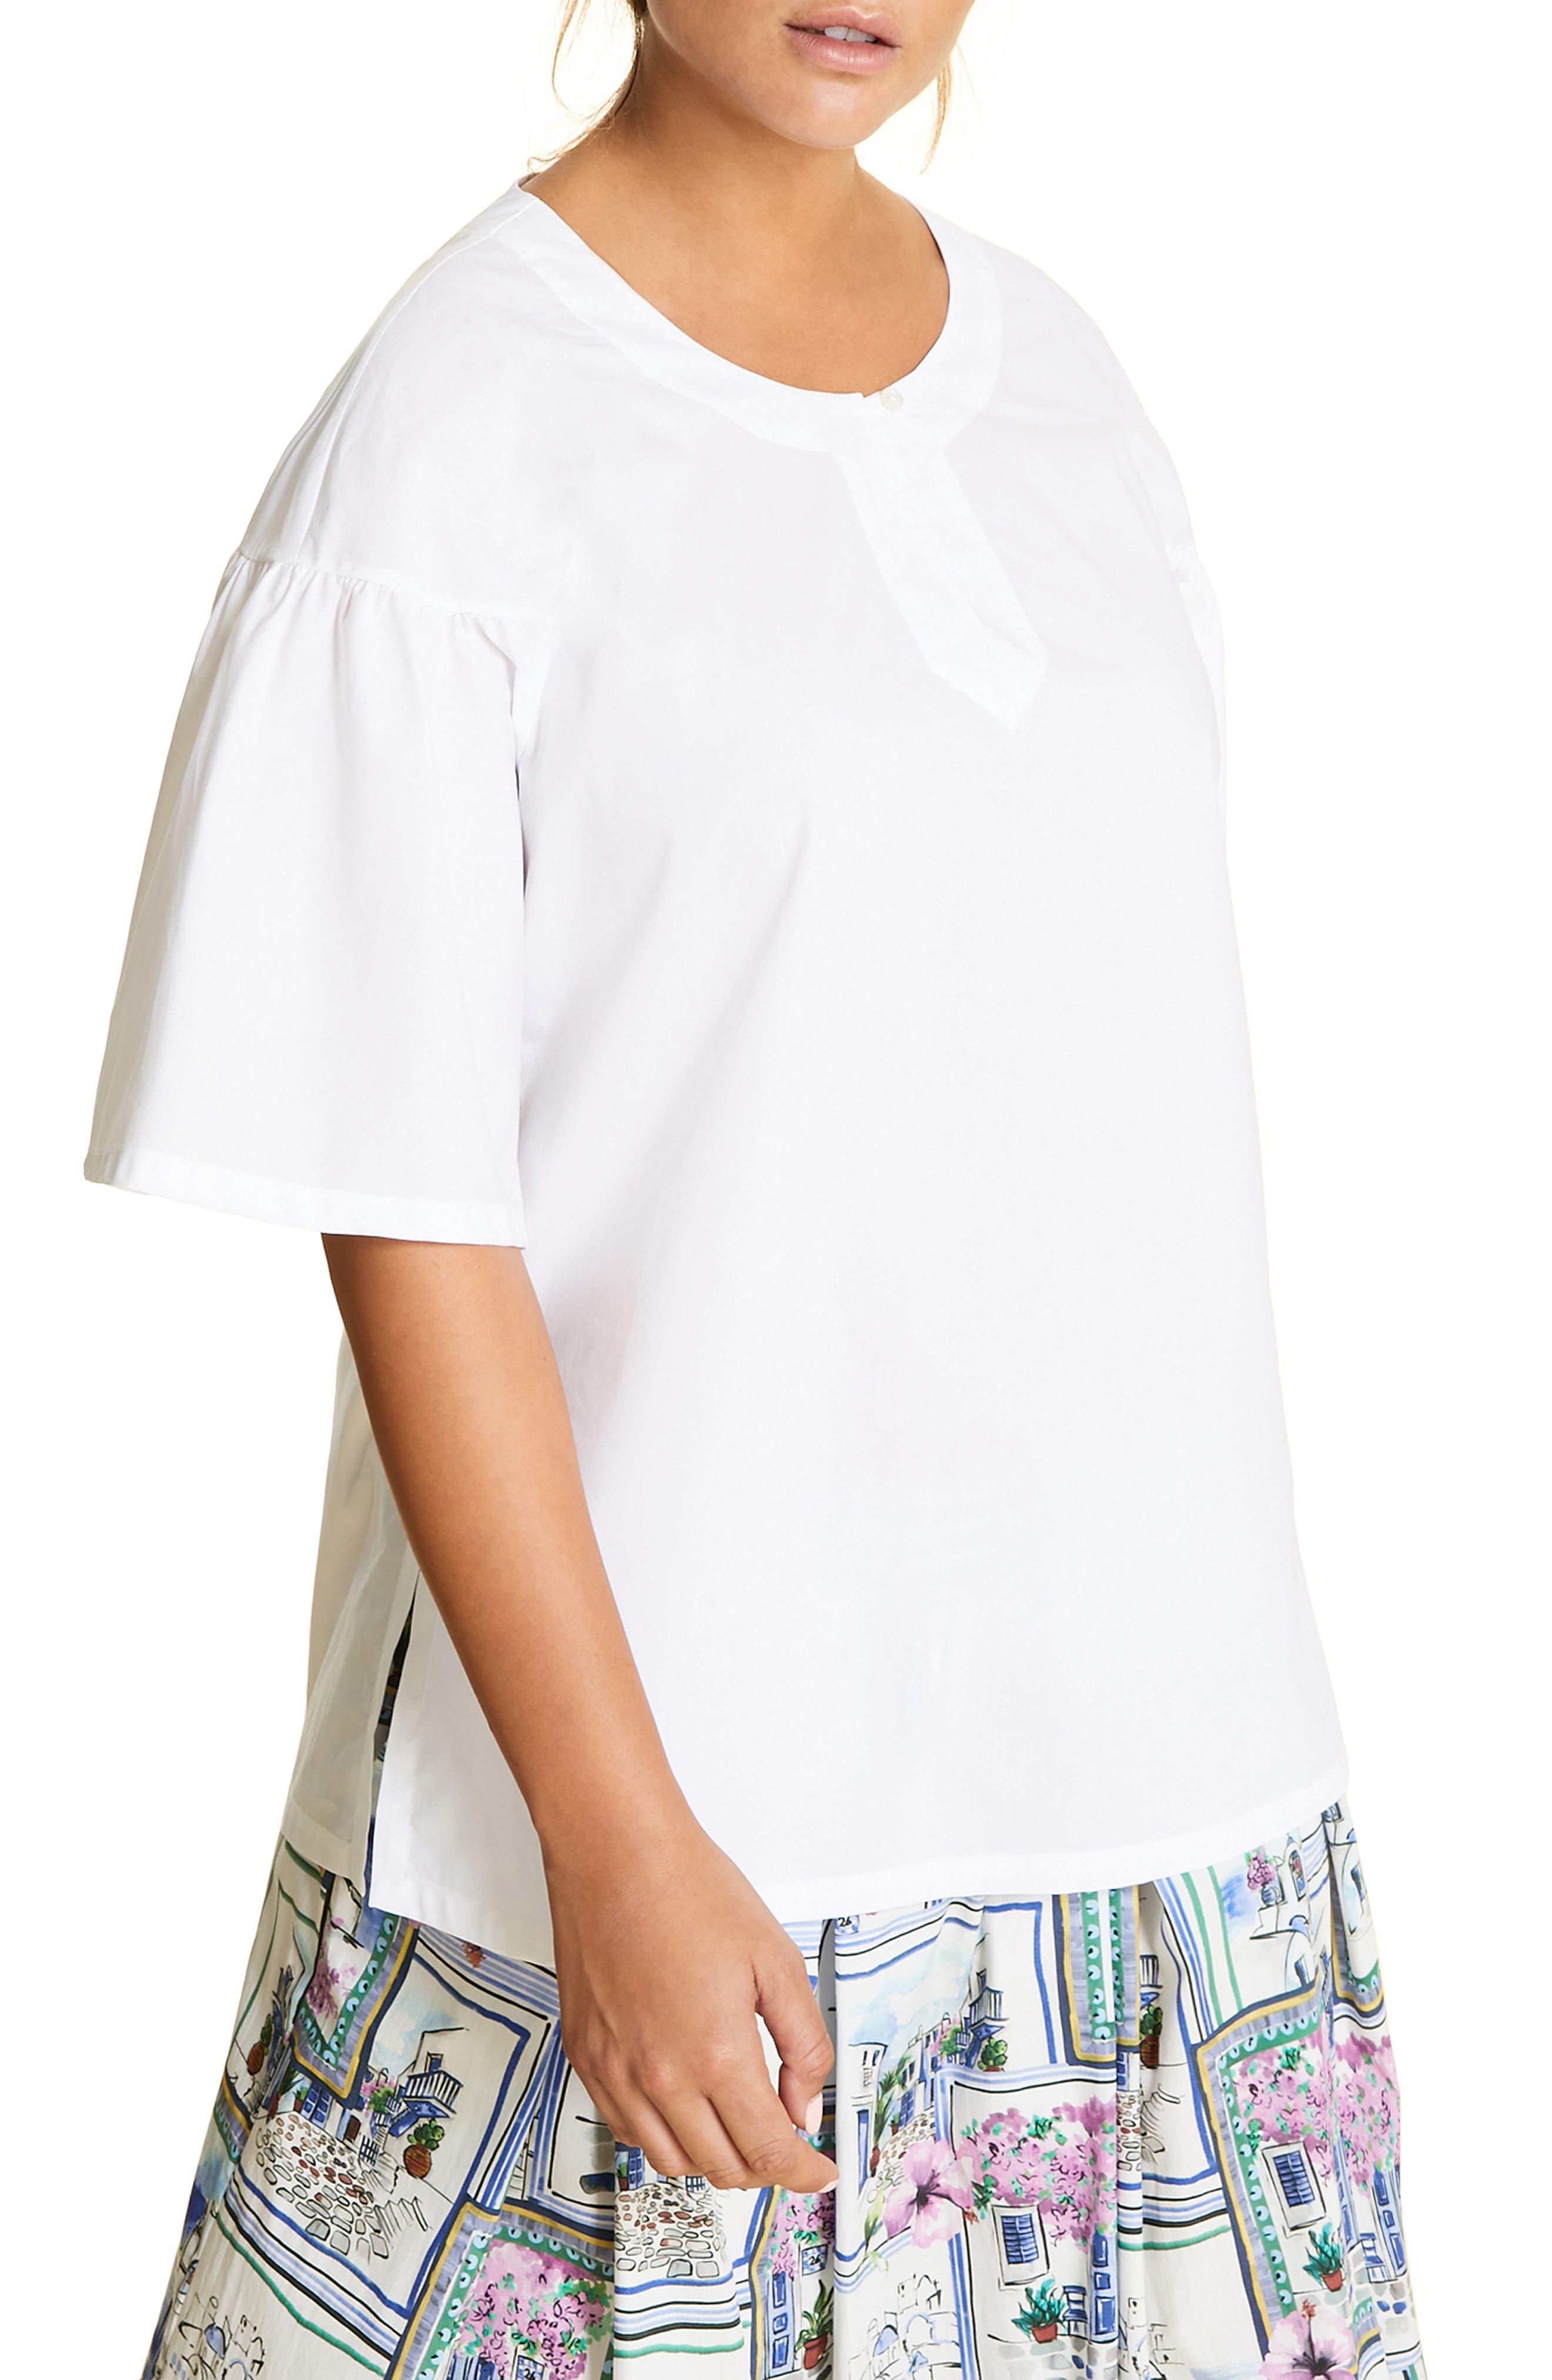 plus size women's marina rinaldi becher cotton shirt